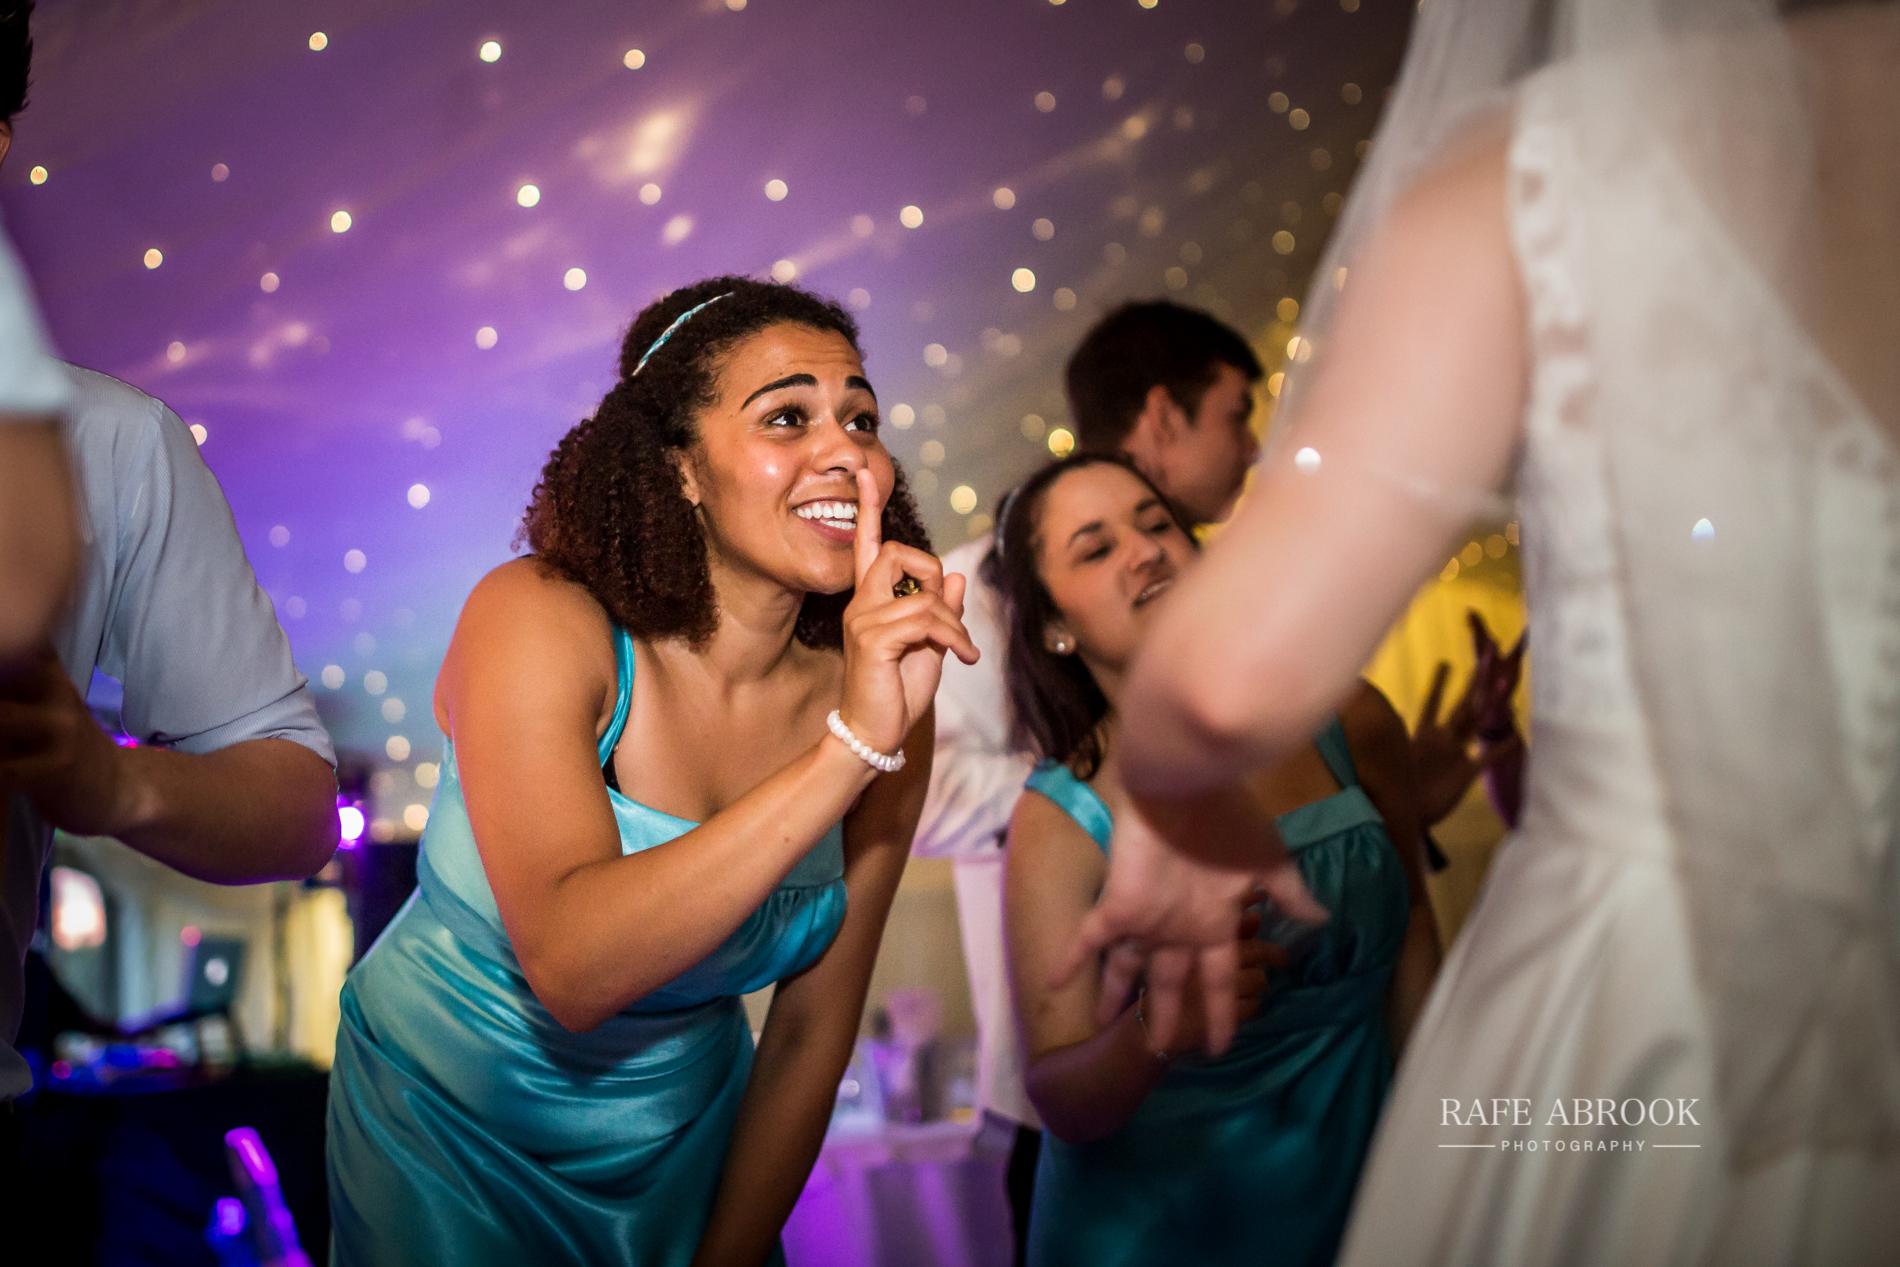 wedding photographer hertfordshire noke thistle hotel st albans -1503.jpg